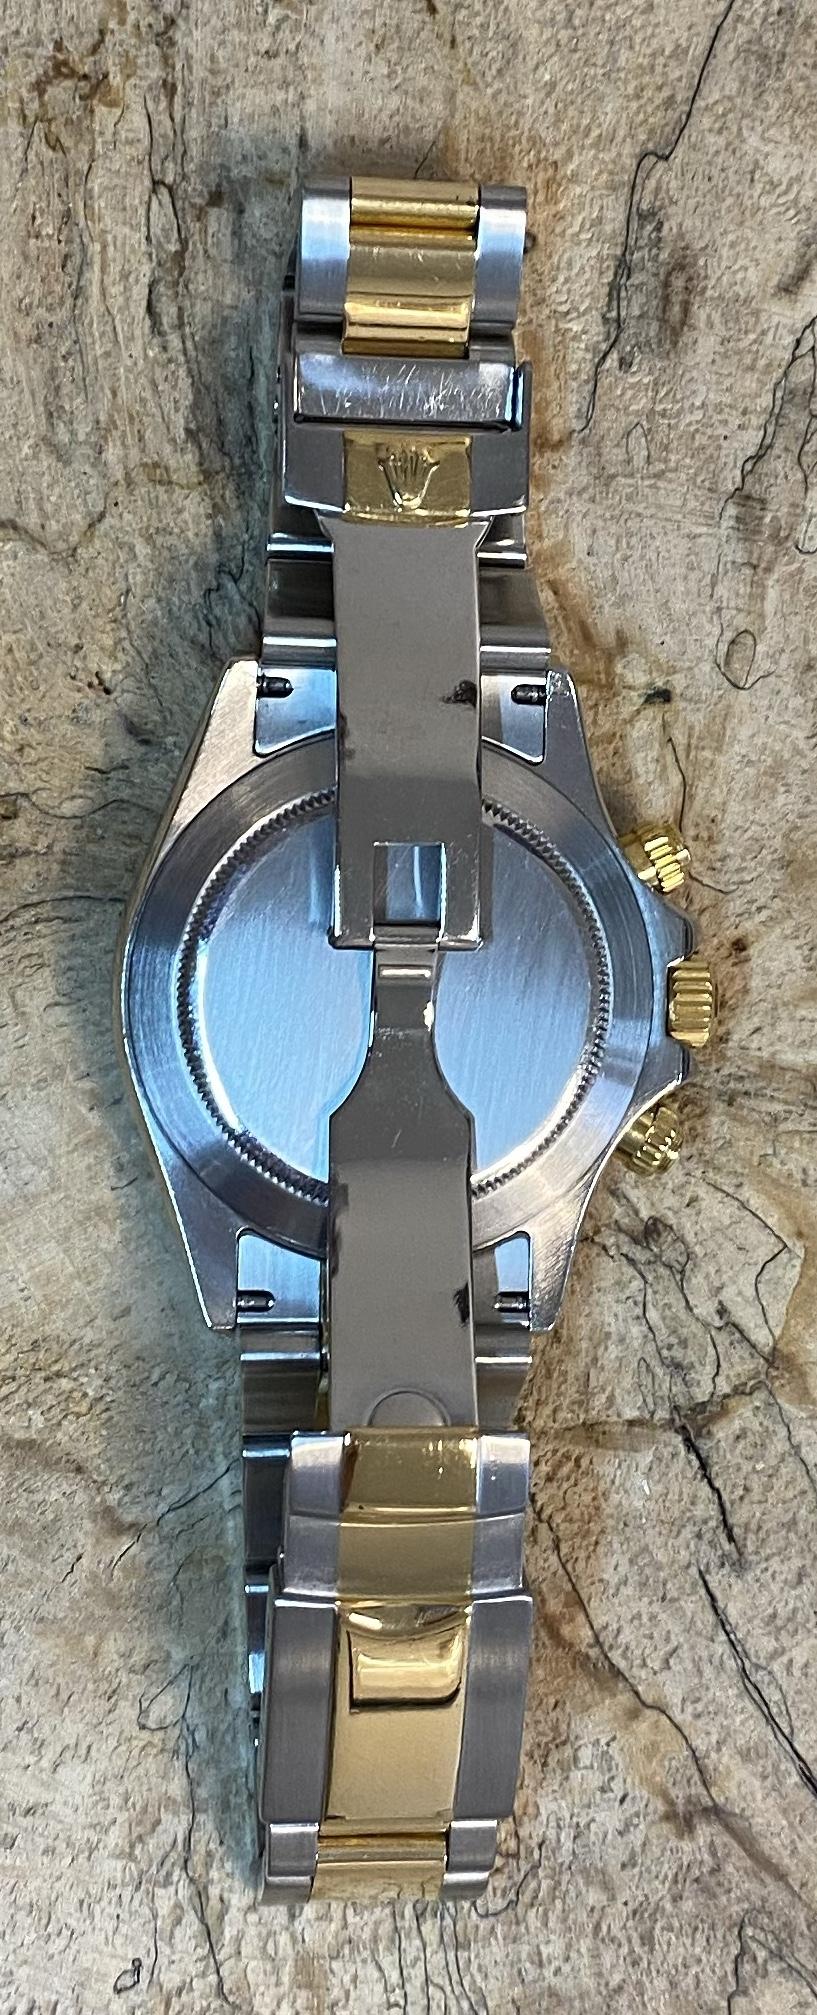 Lot 2 - Rolex Daytona 116523 18ct Gold & Stainless Steel (2003)